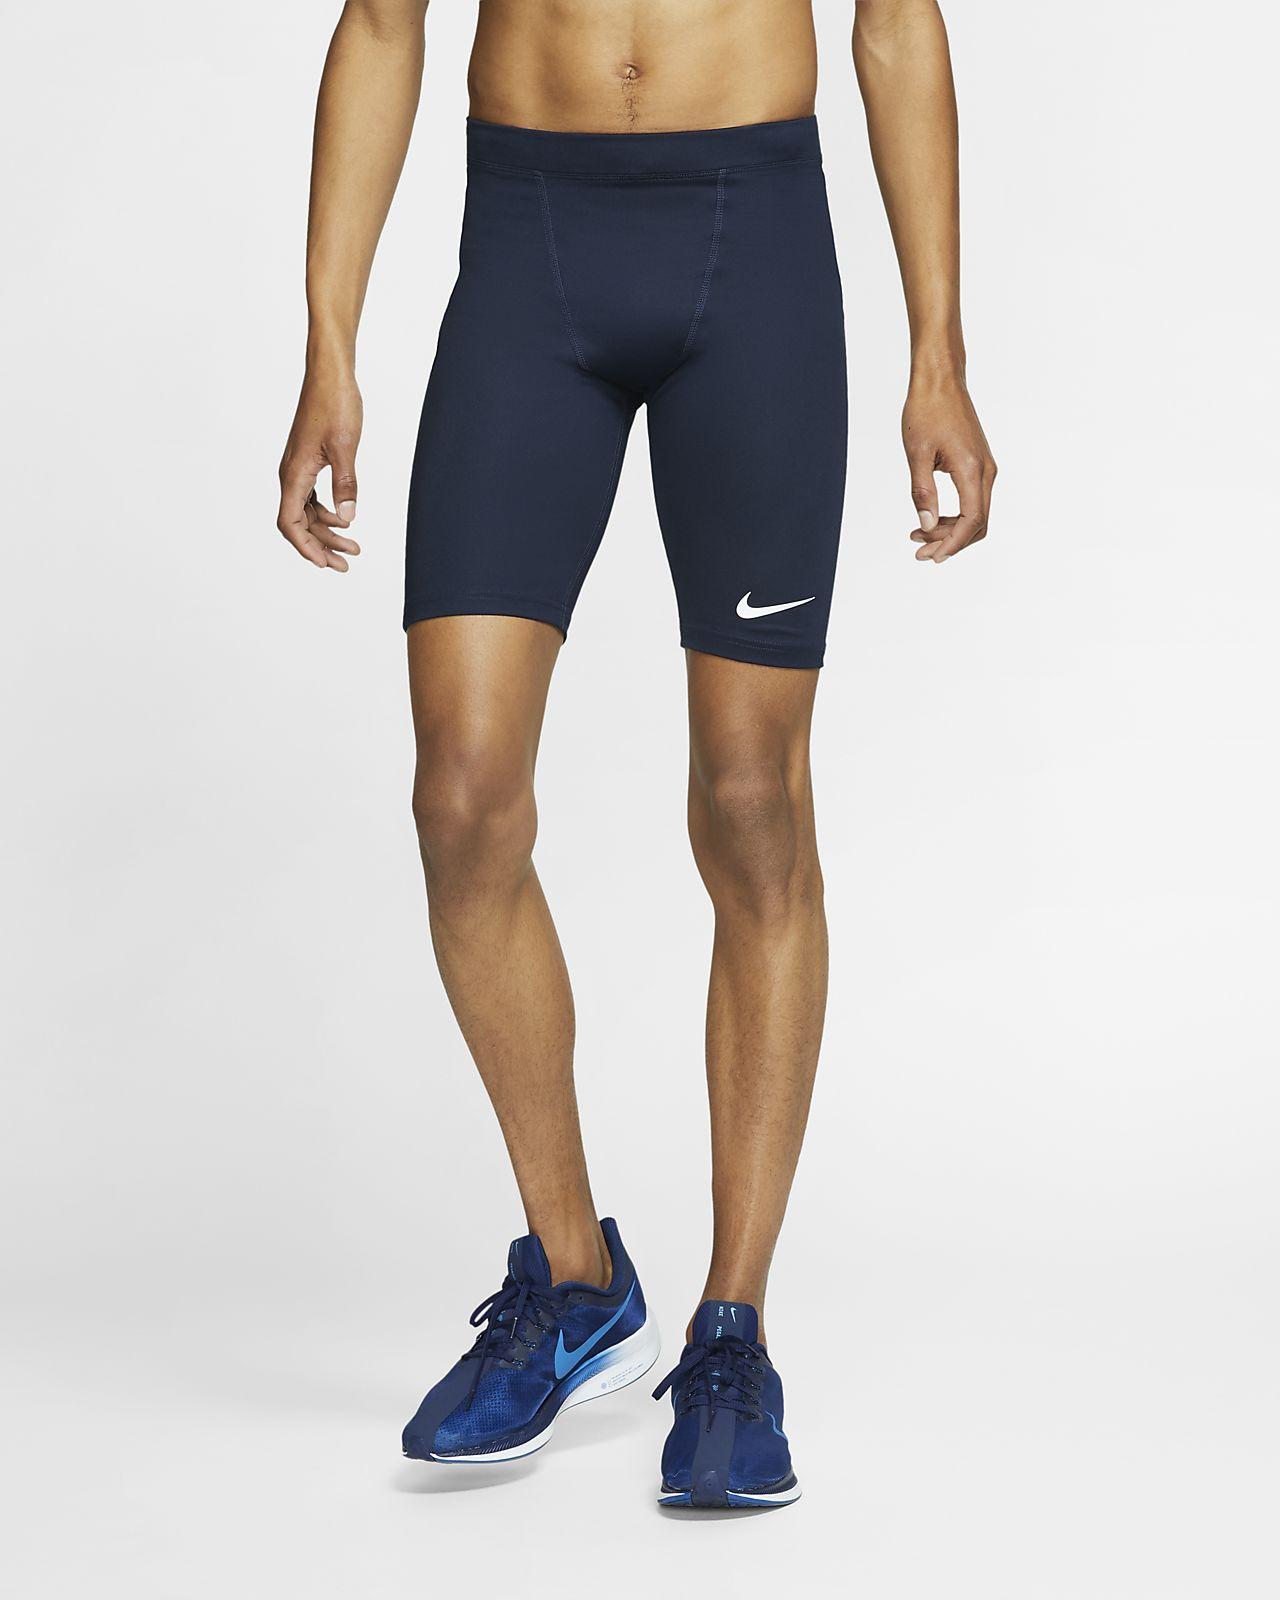 Pánské běžecké legíny Nike Power